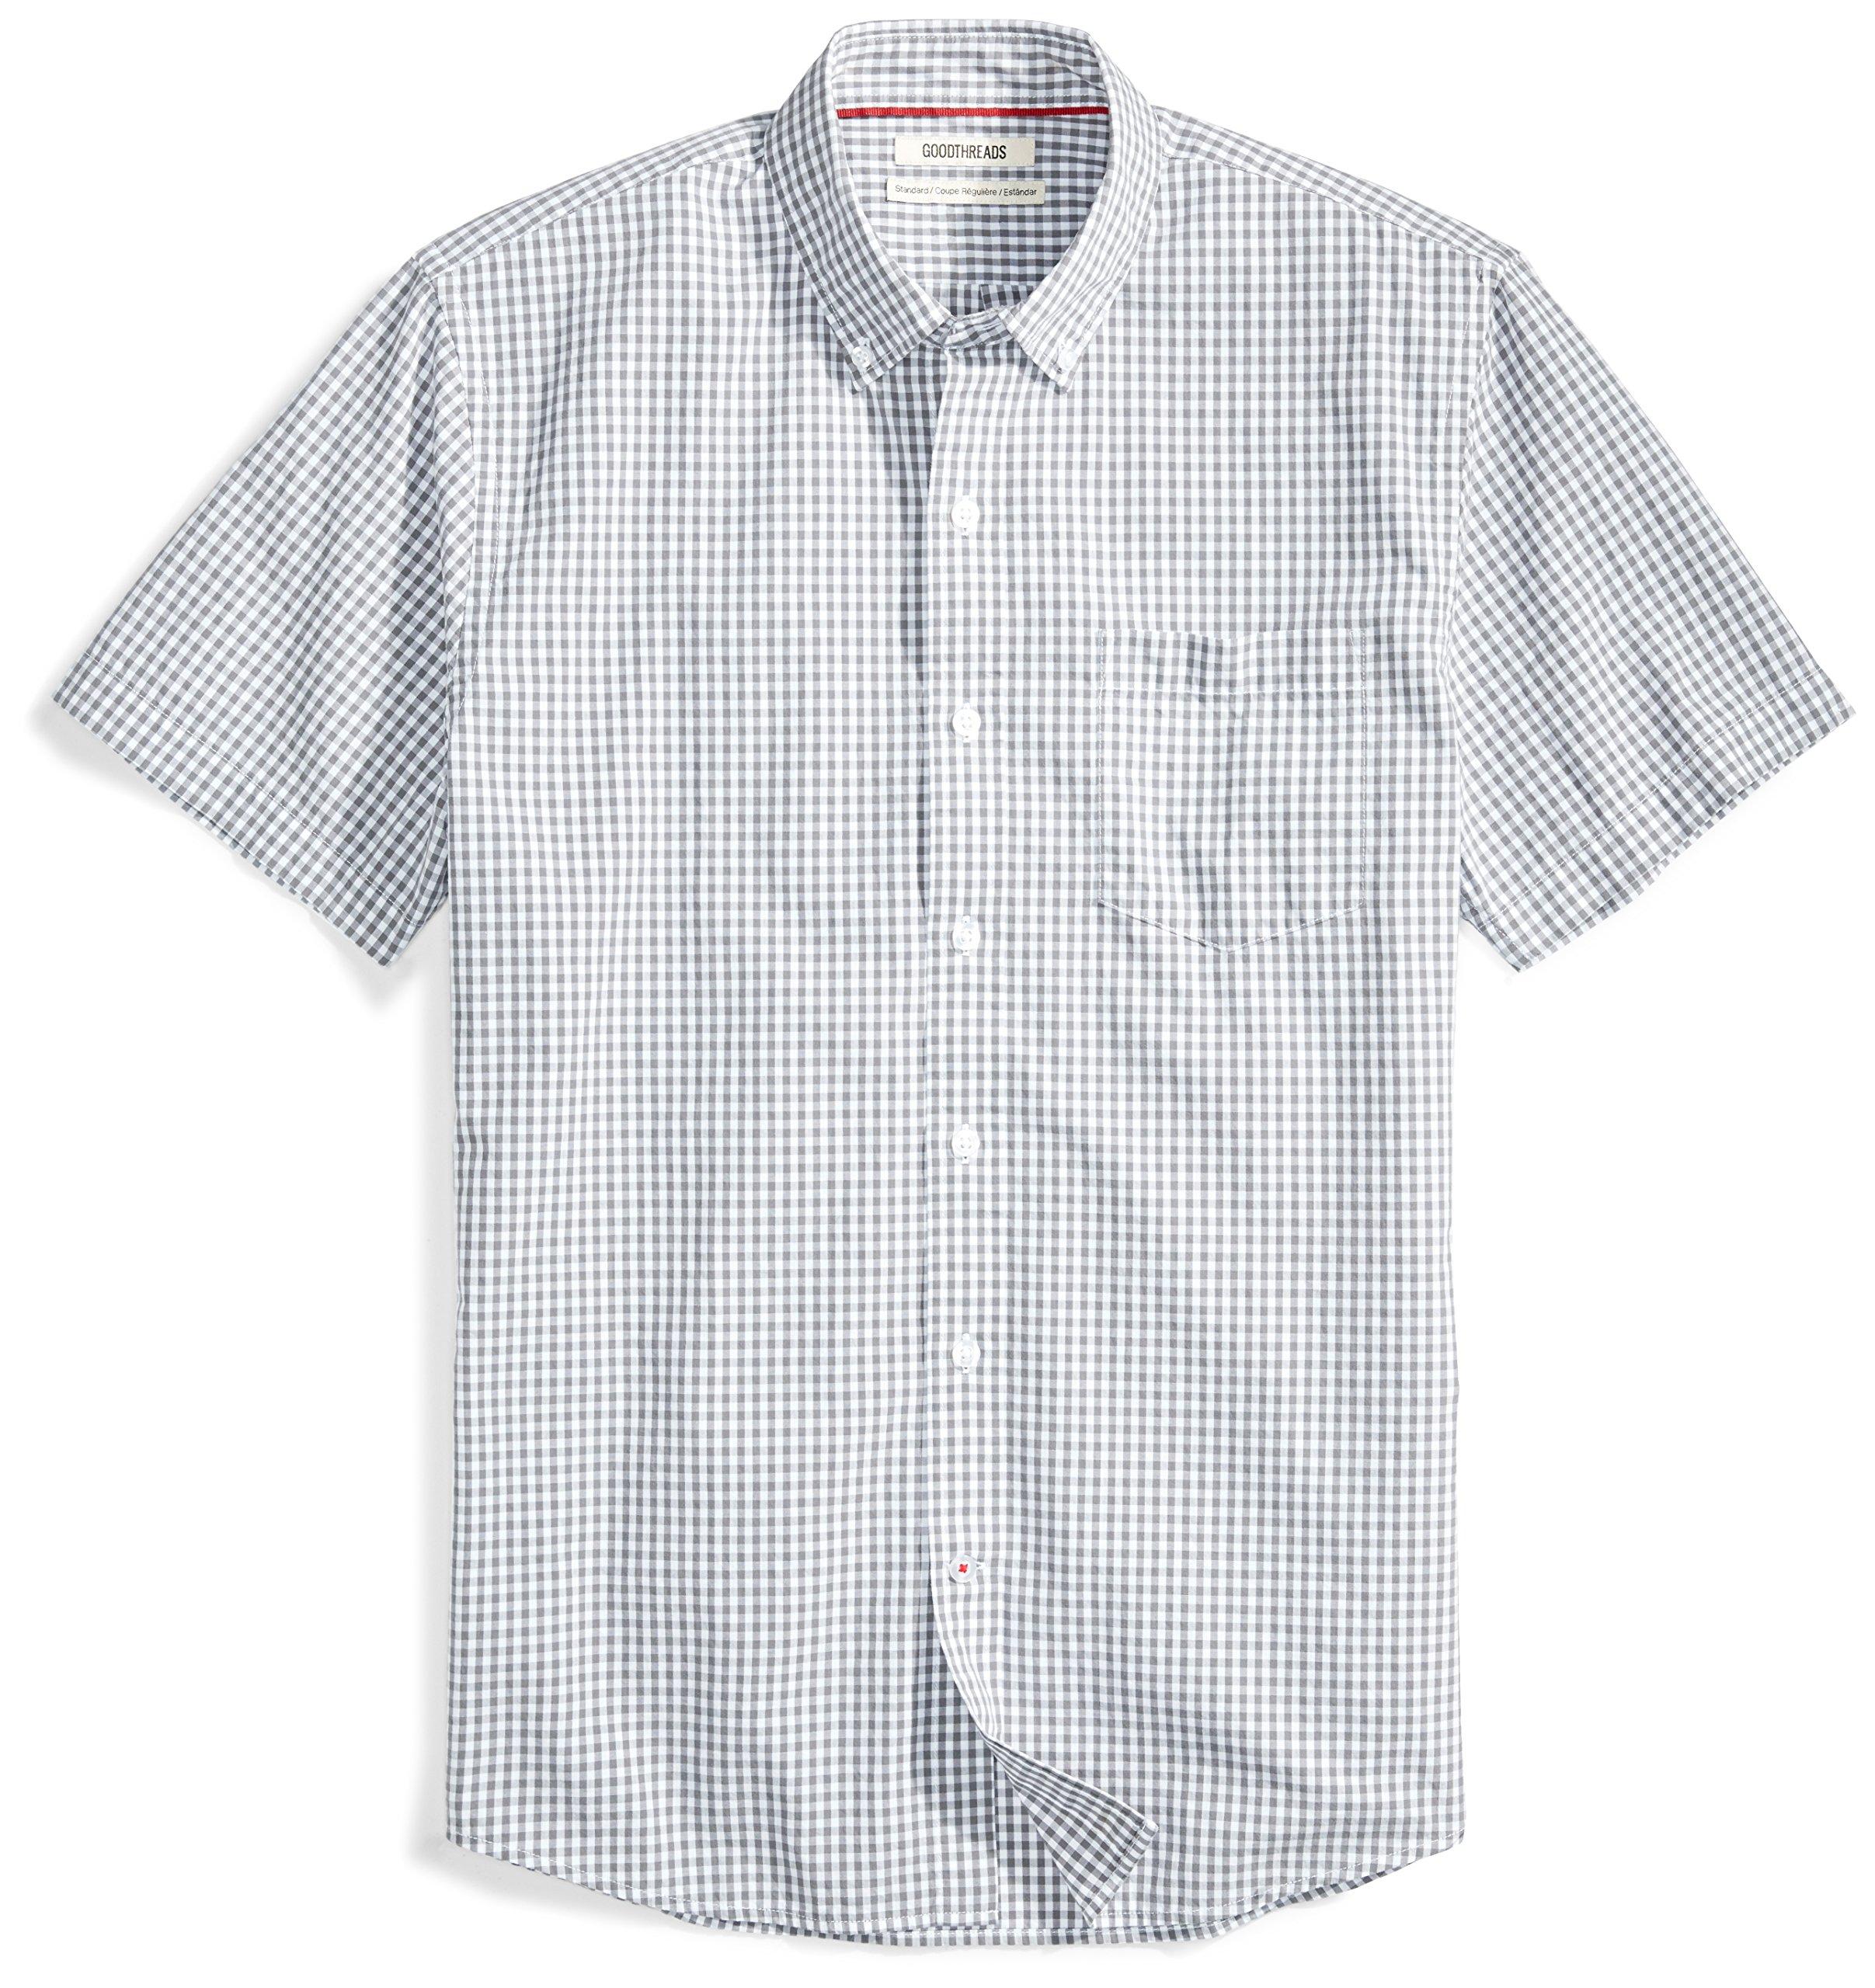 Goodthreads Men's Standard-Fit Short-Sleeve Two-Color Check Shirt, White/Grey, Medium